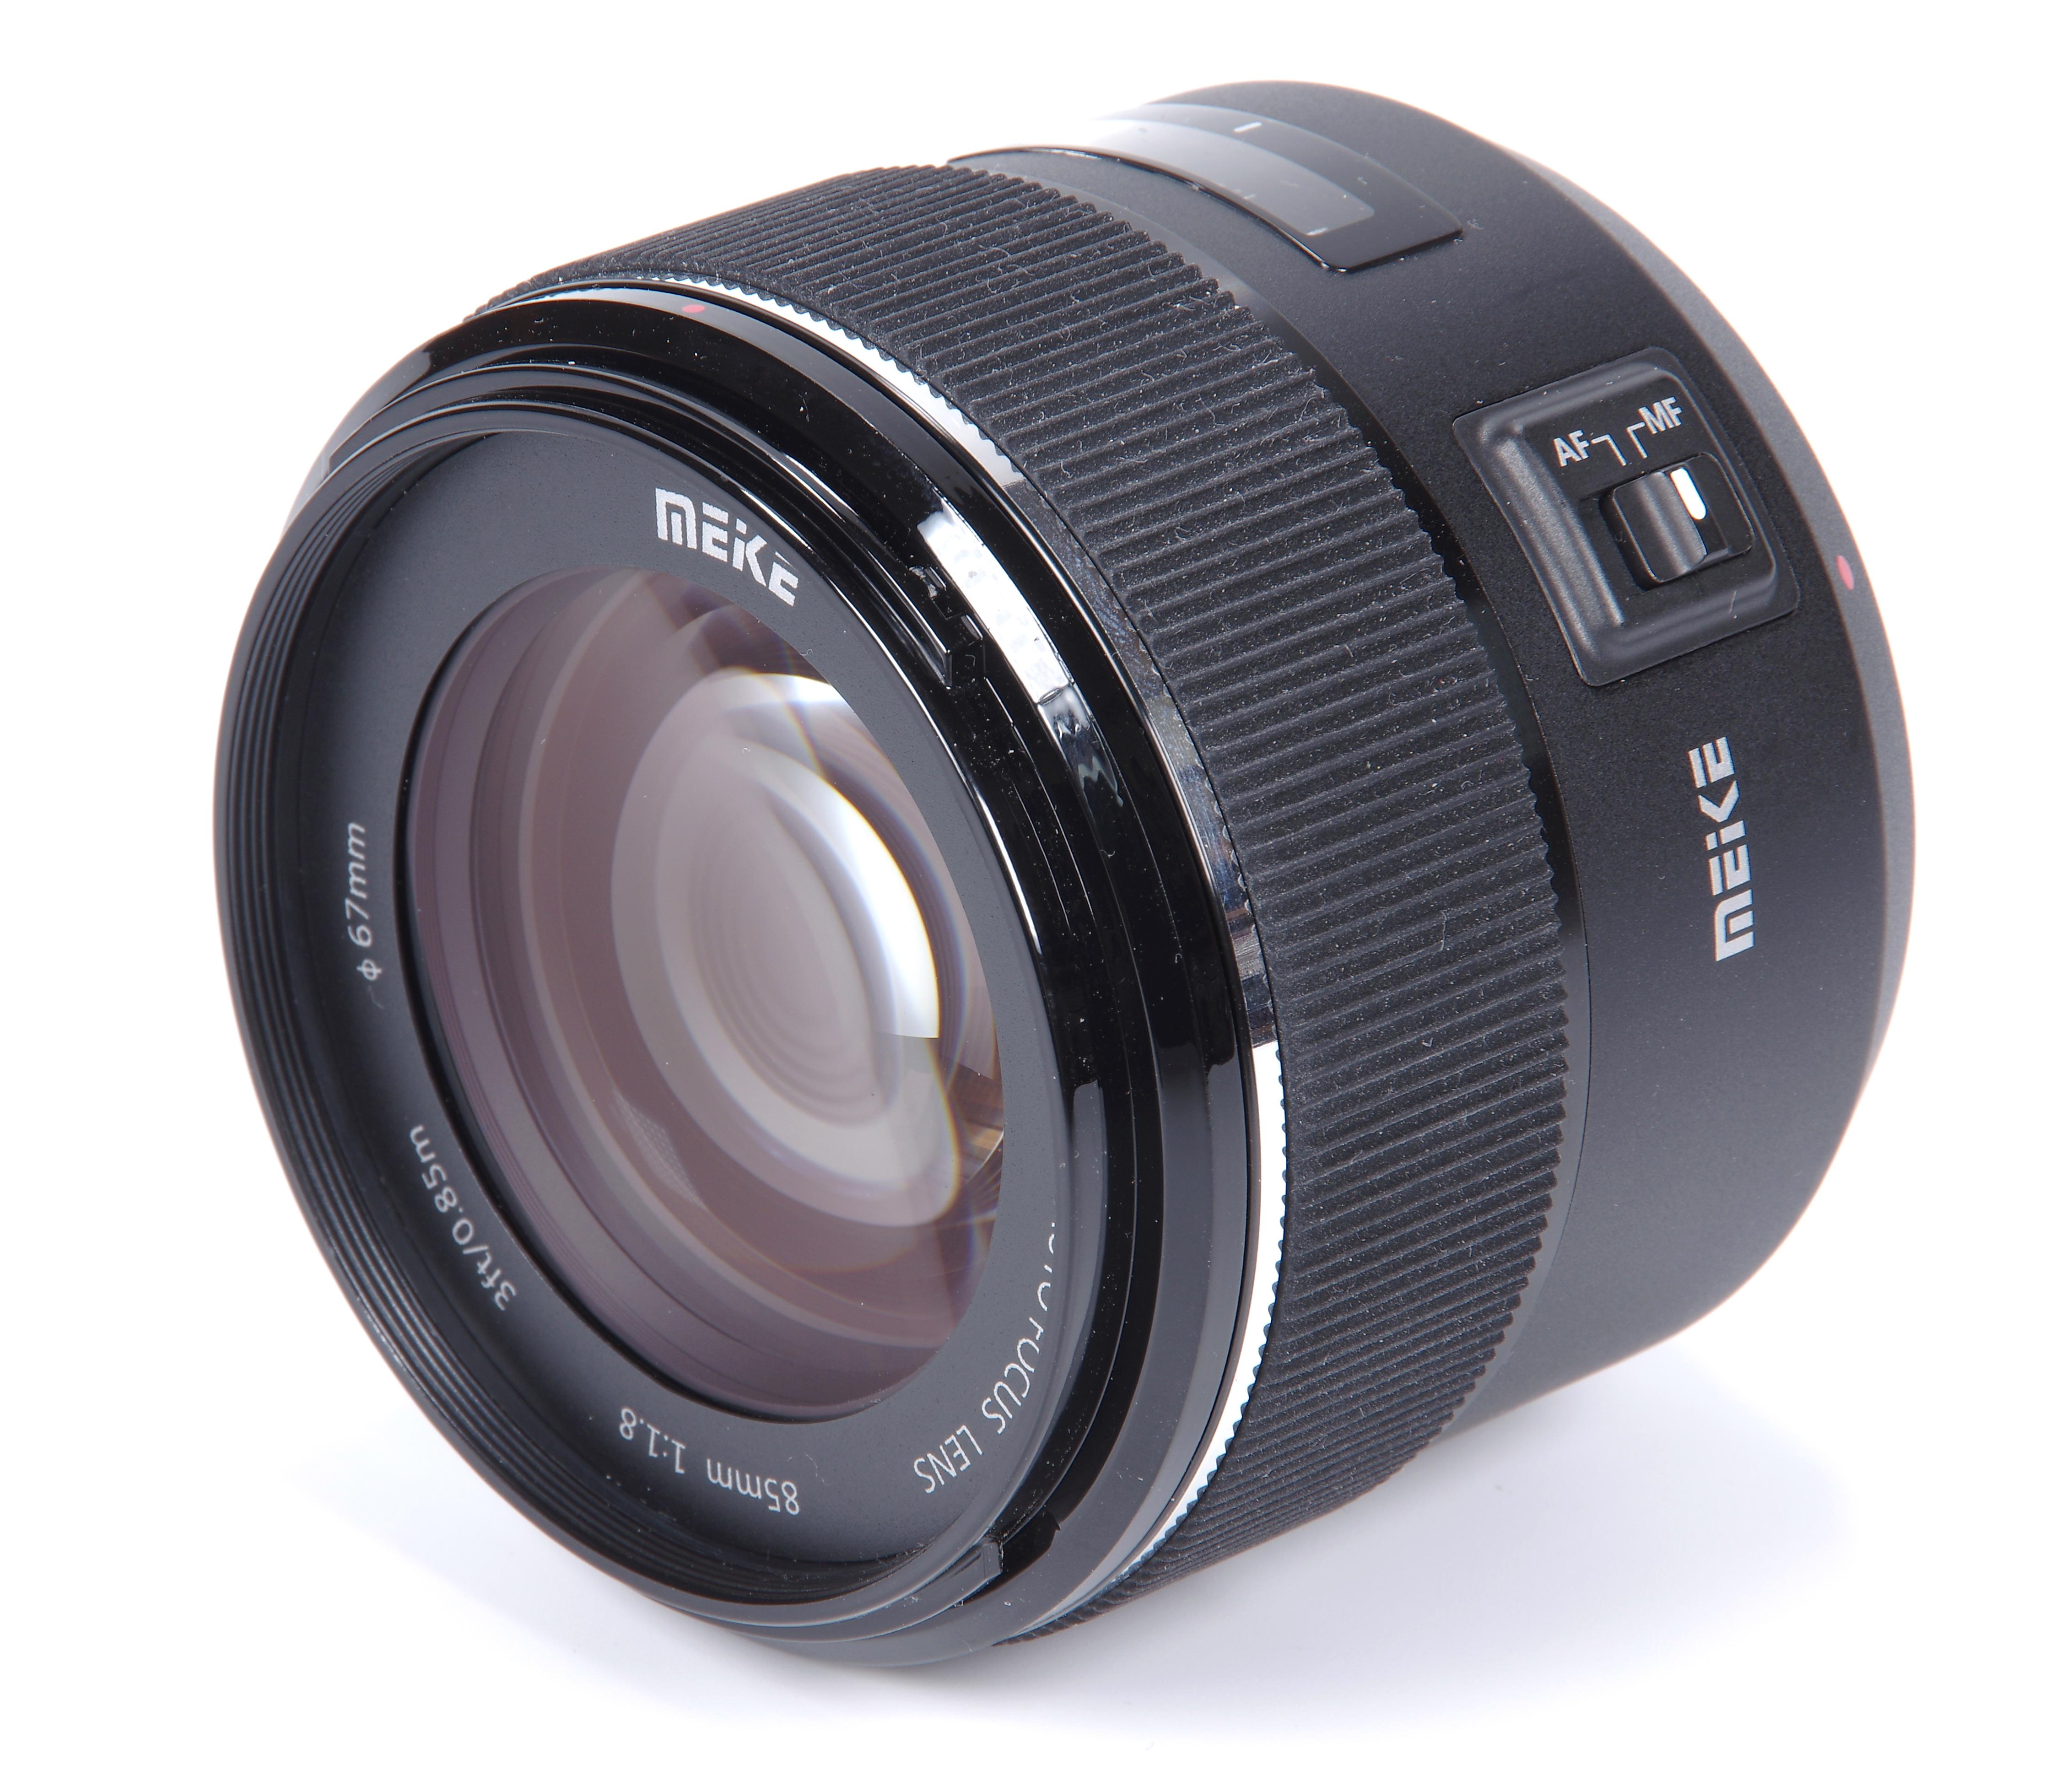 Top 11 Best Budget Canon EF / EF-S Mount Lenses 2019